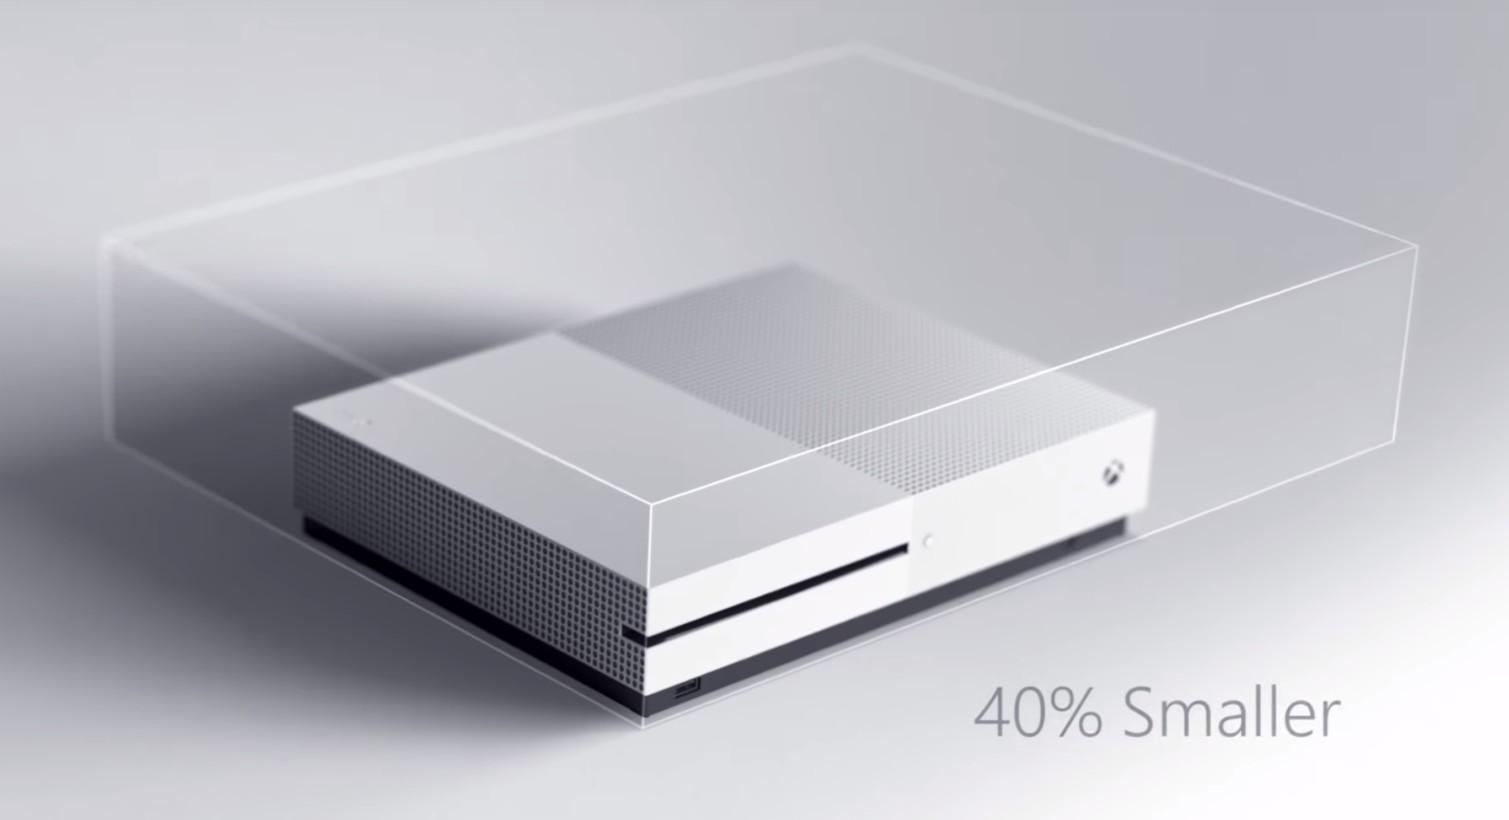 xbox-one-s-size